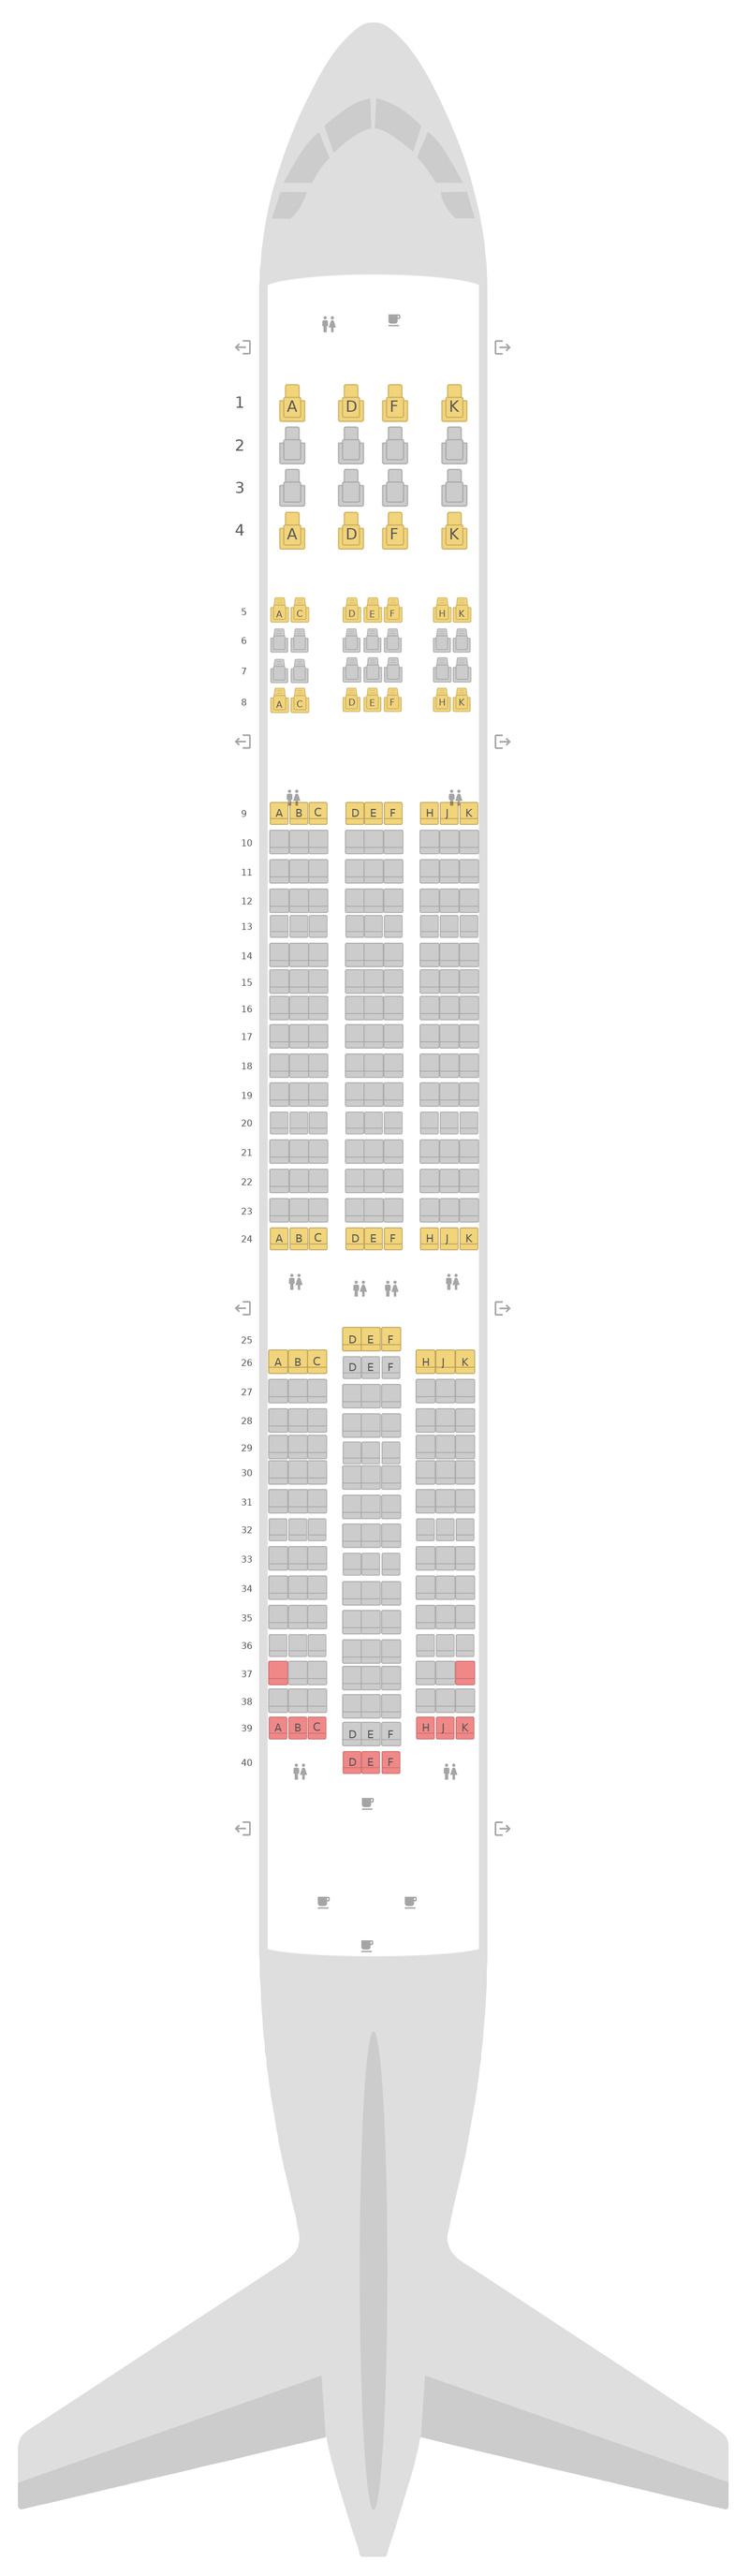 Sitzplan Boeing 787-9 (789) WestJet